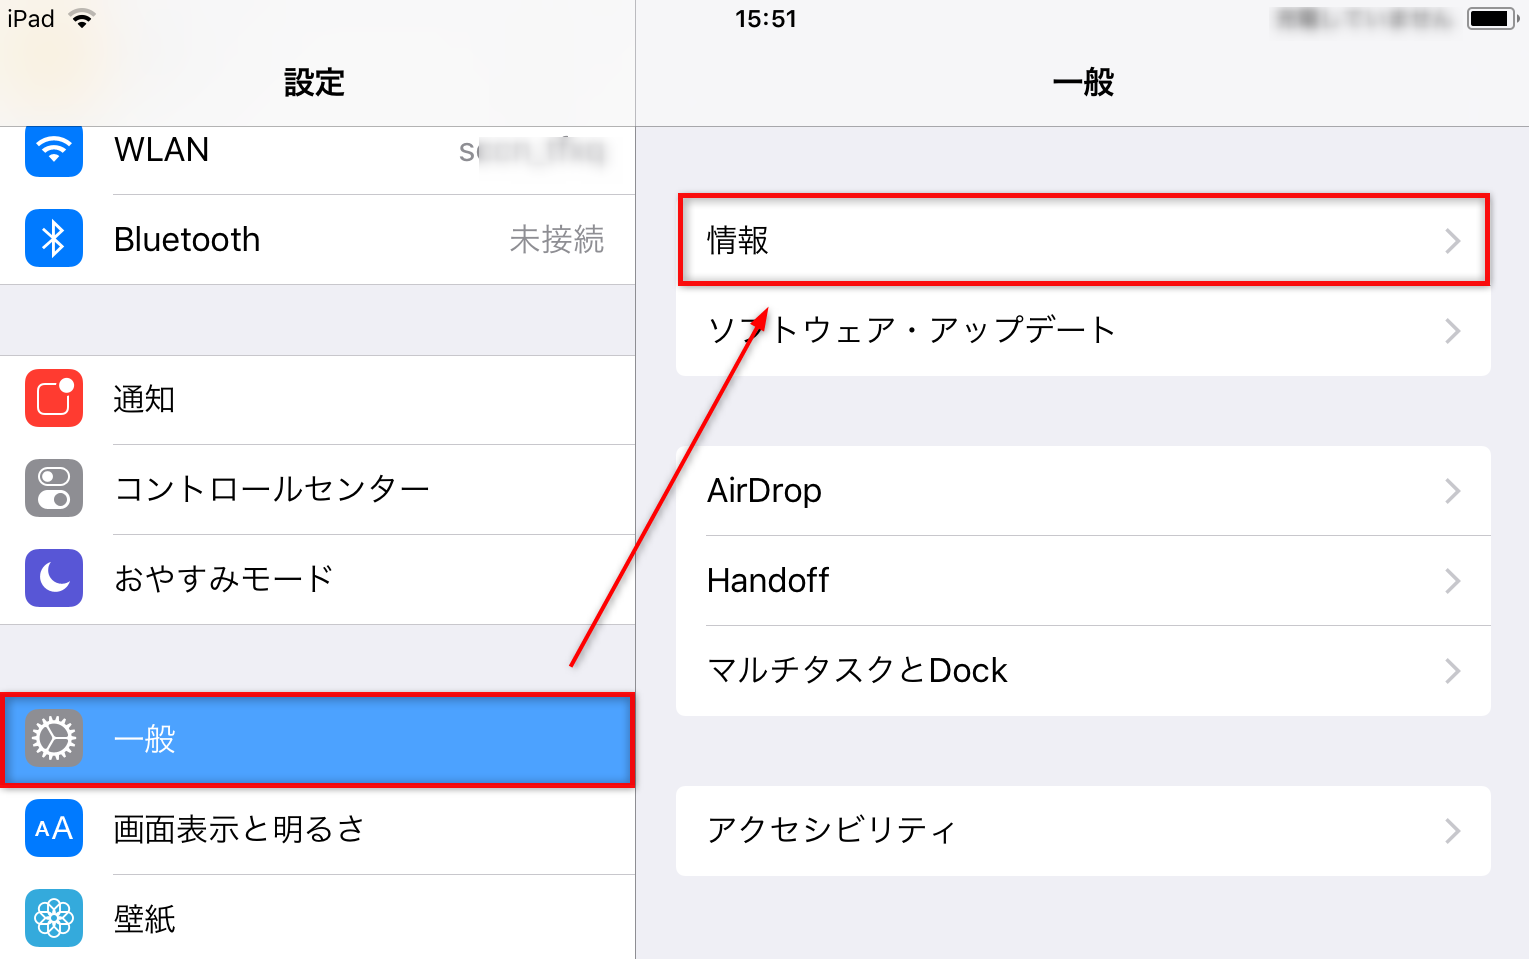 iPadでiOSのバージョンを確認する方法 2